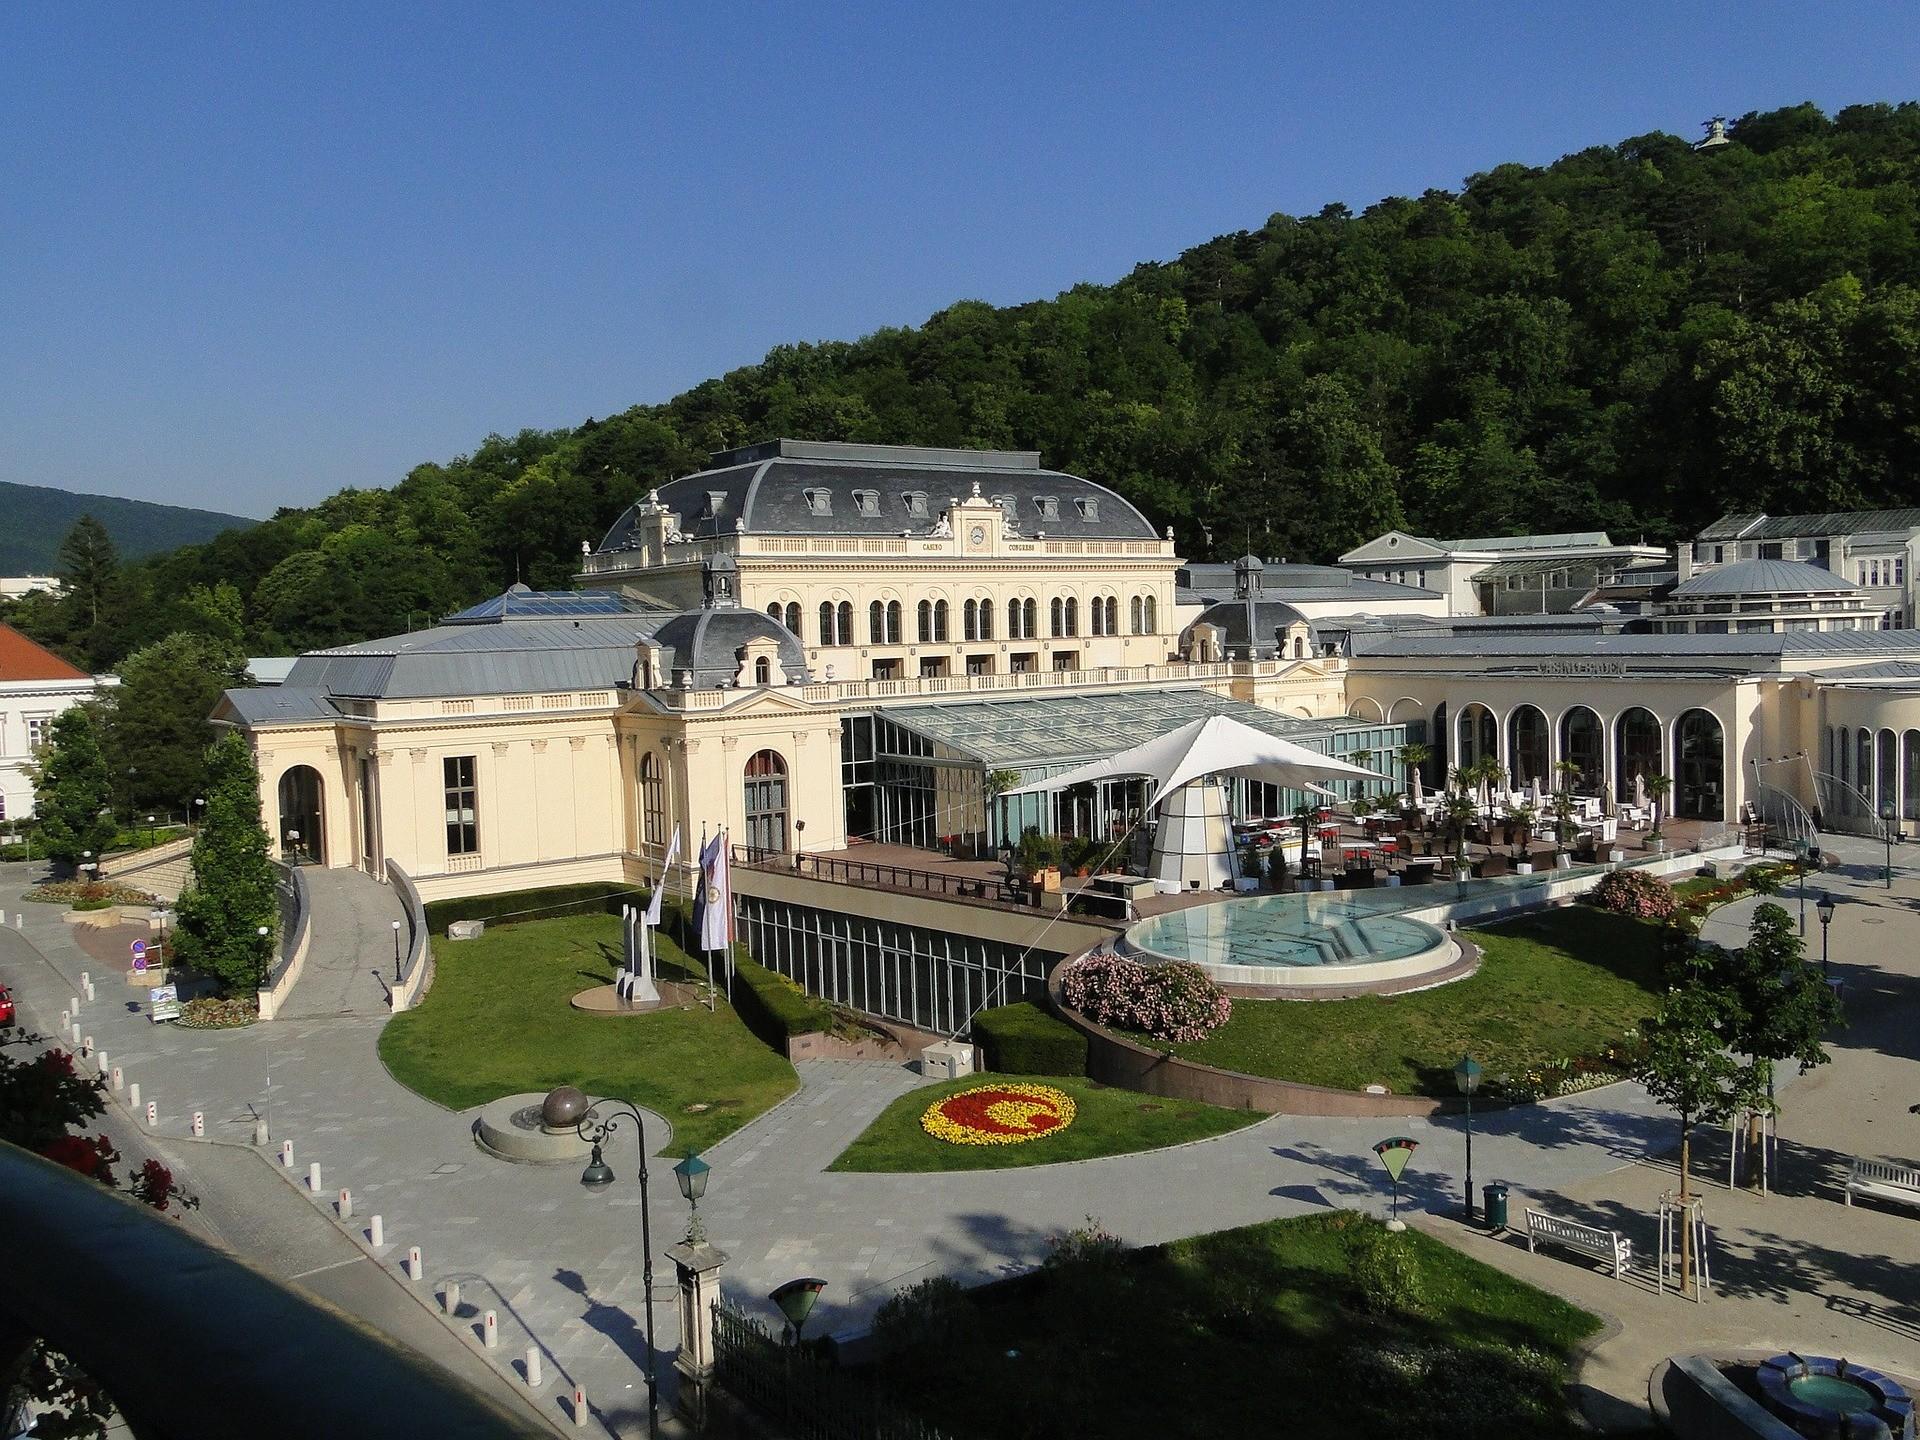 Dintorni di Vienna: Casino di Baden, Austria - Foto di Edelgard Hennicke